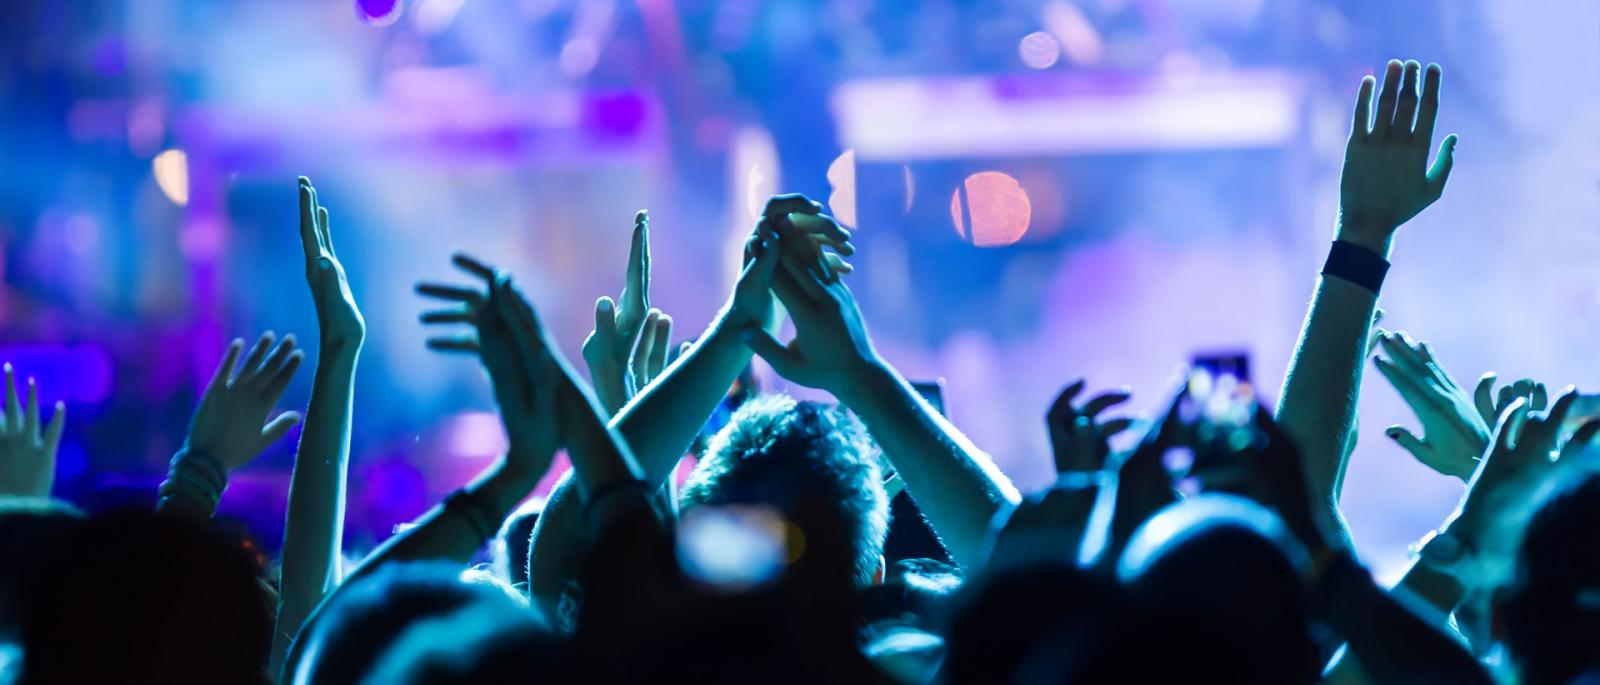 Concert Tickets New York City